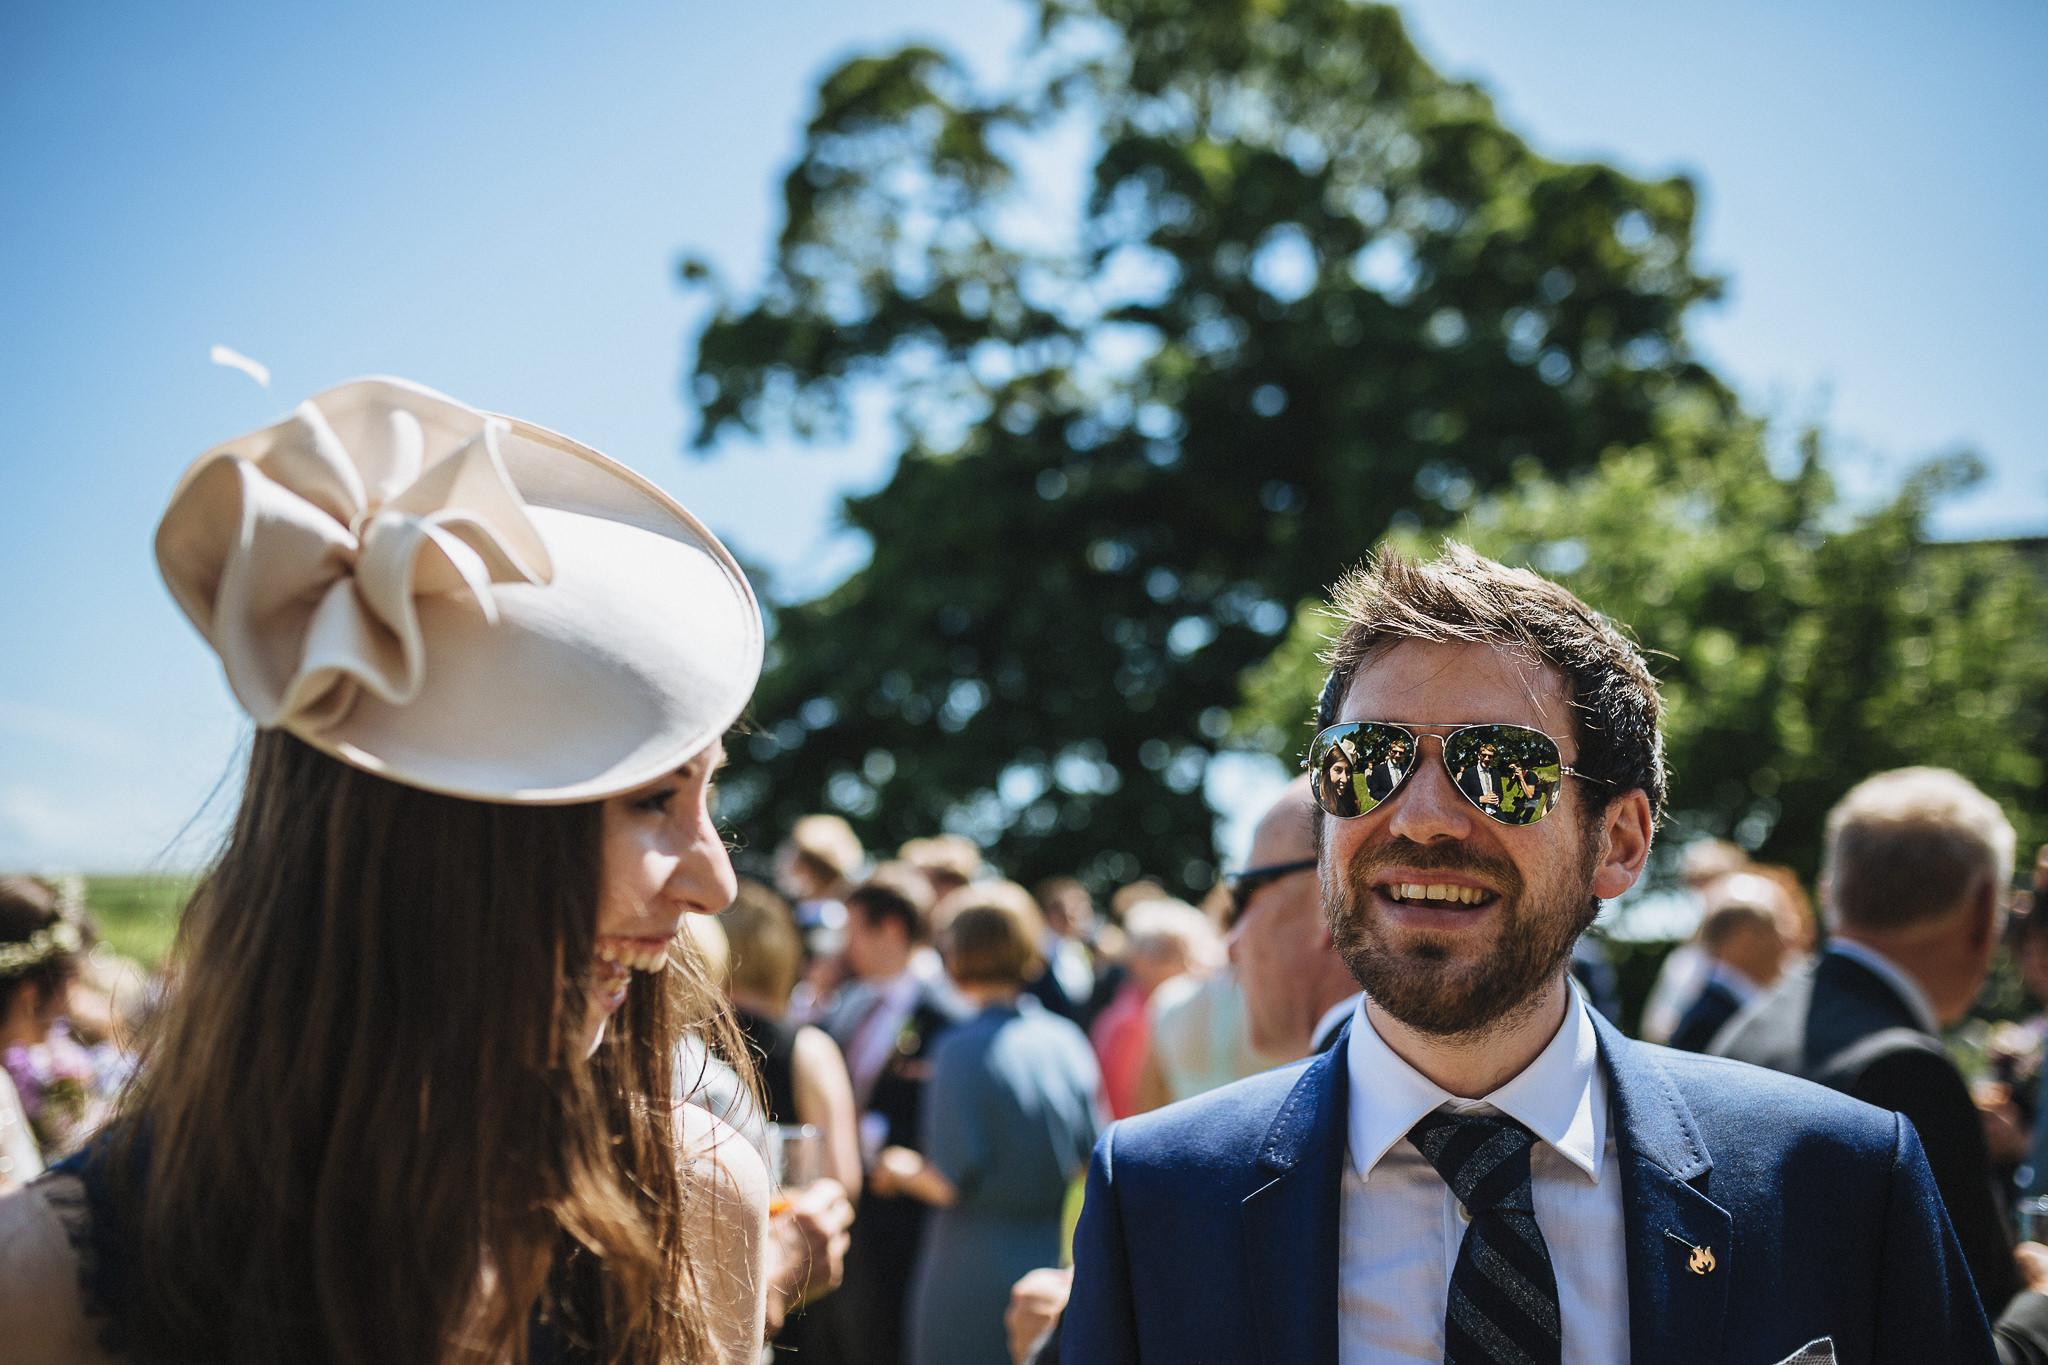 paul-marbrook-Farm-Wedding-Photographer-Lancashire-90050